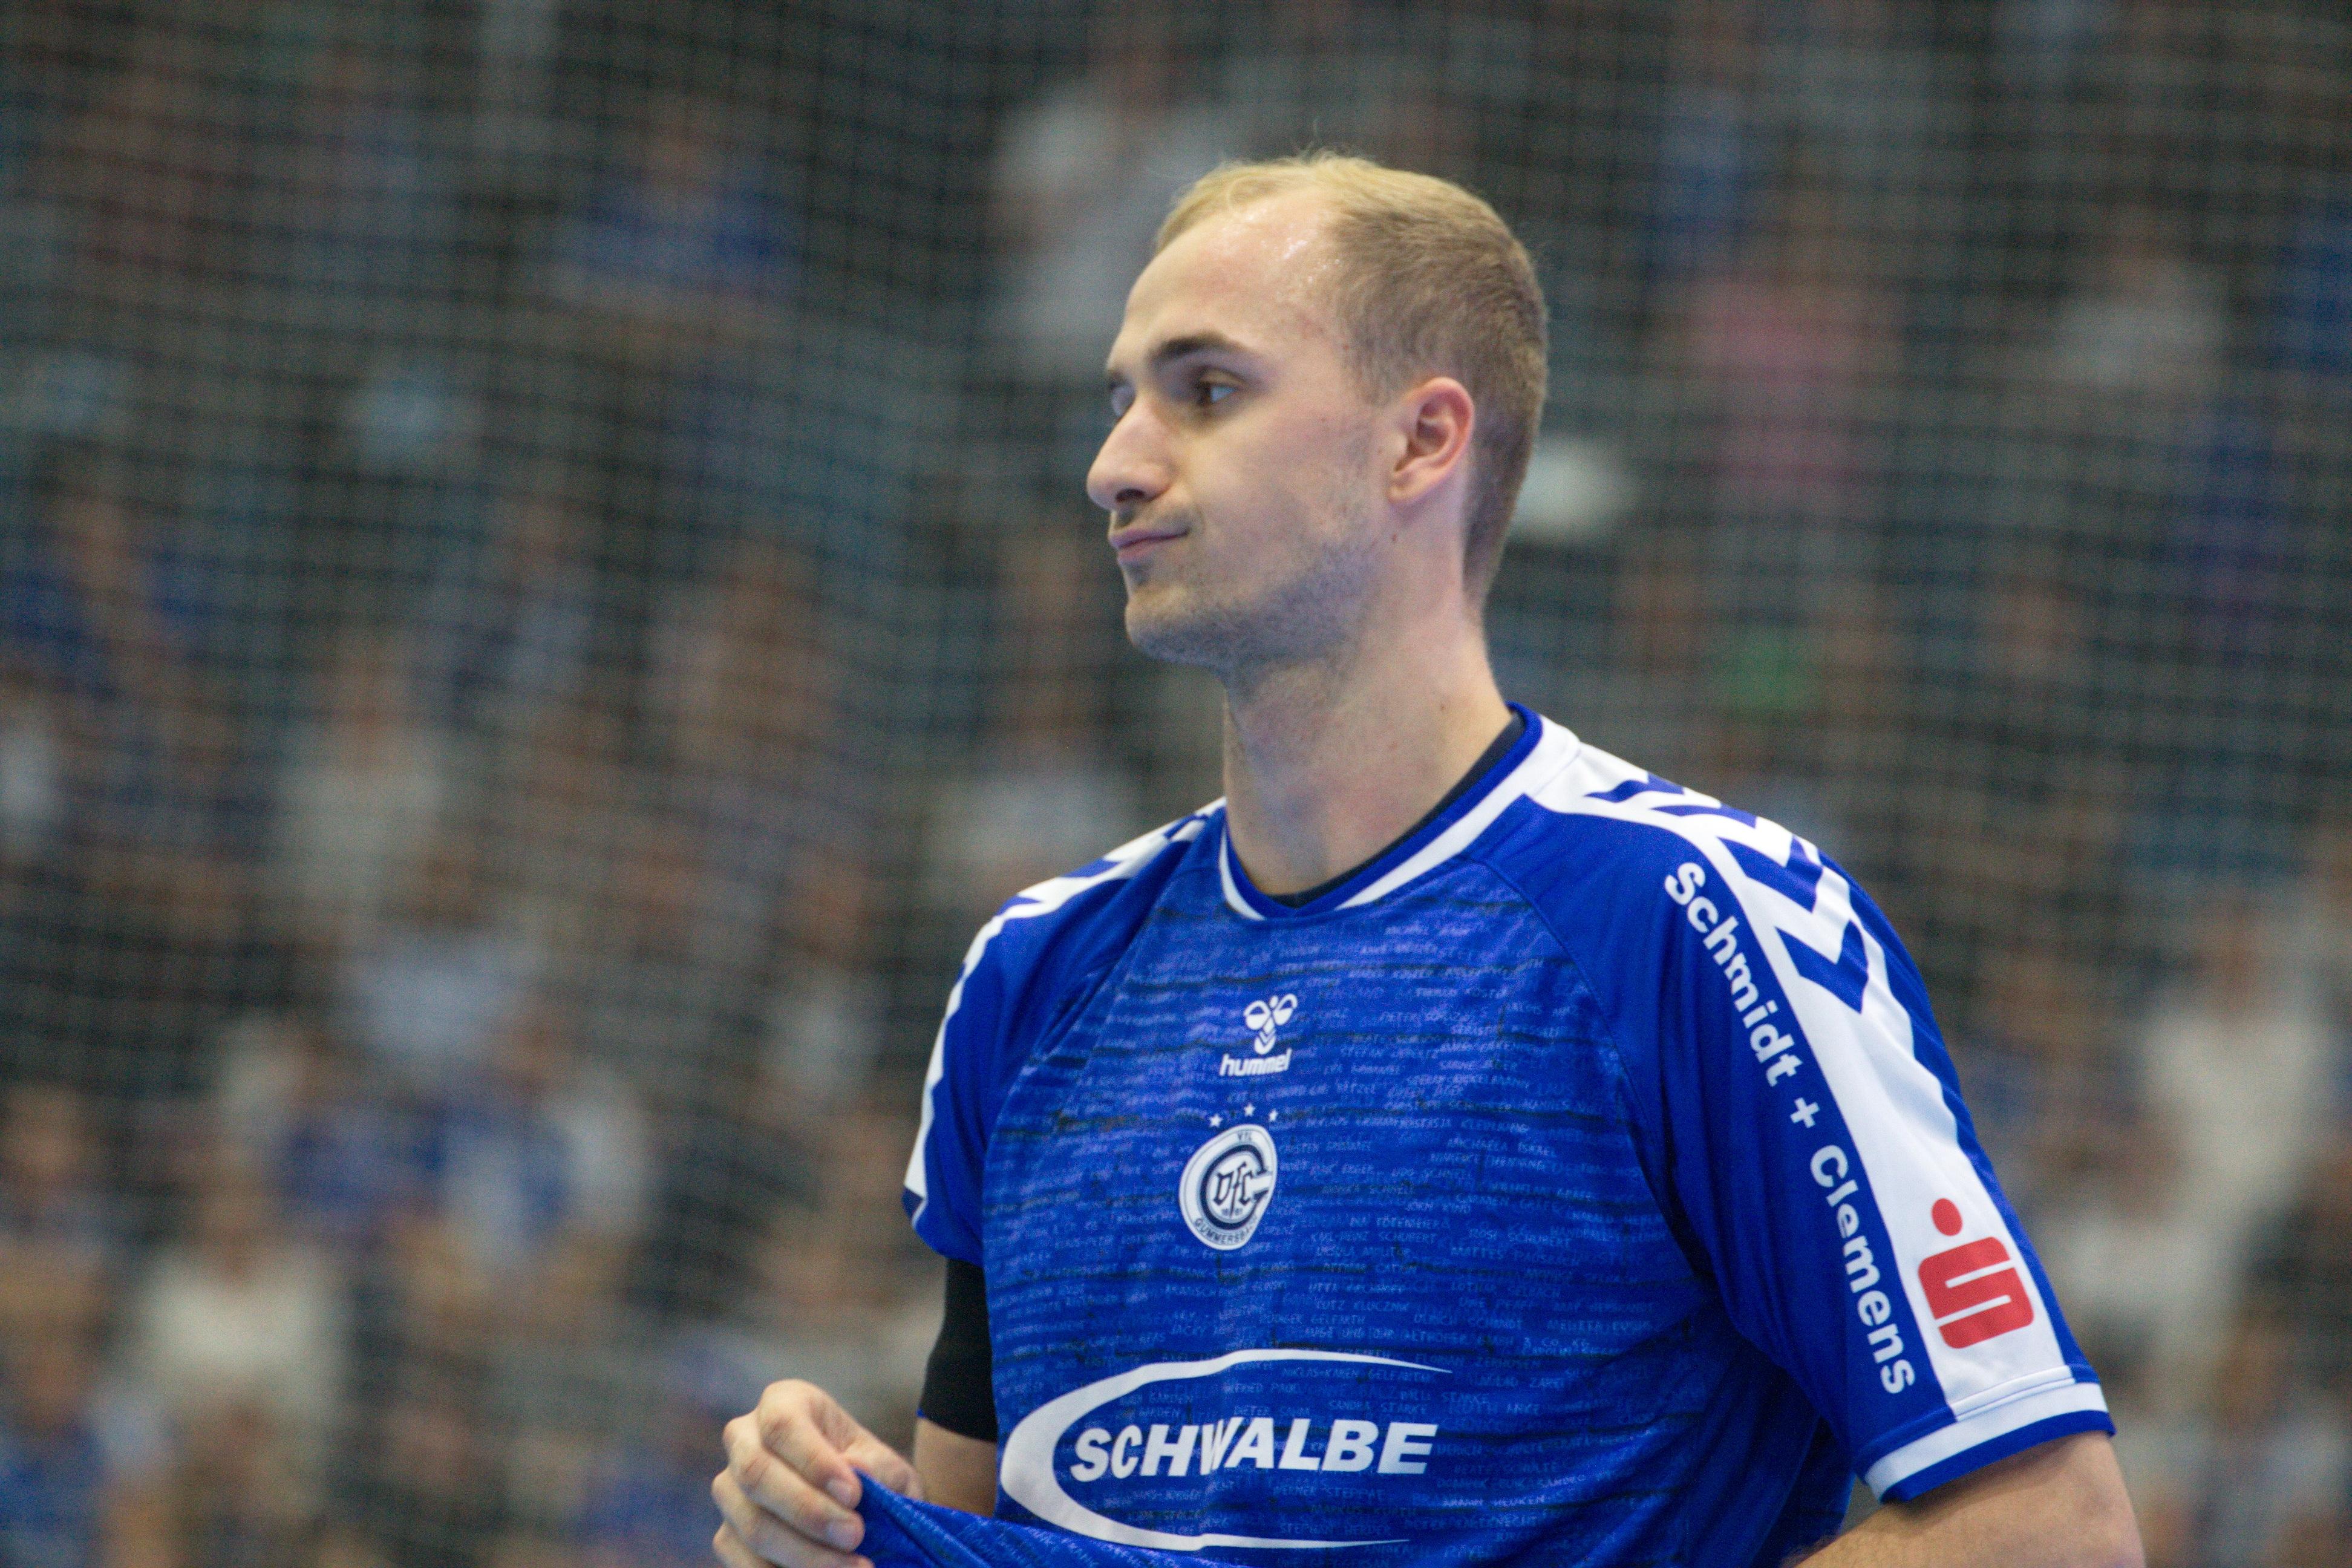 Florian Baumgärtner